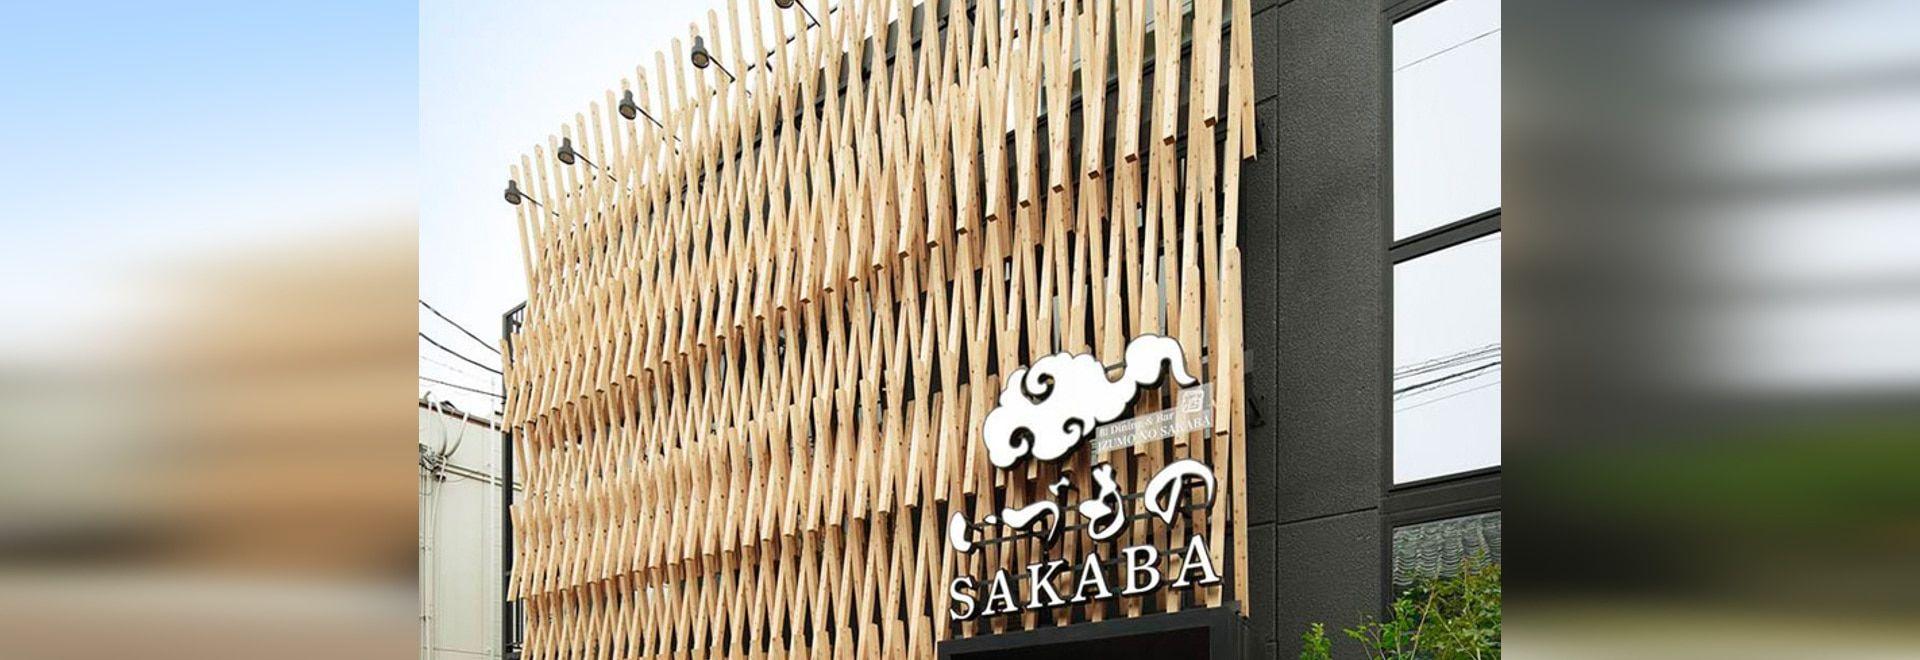 celosía - restaurante - fachada - interiorismo - arquitectura